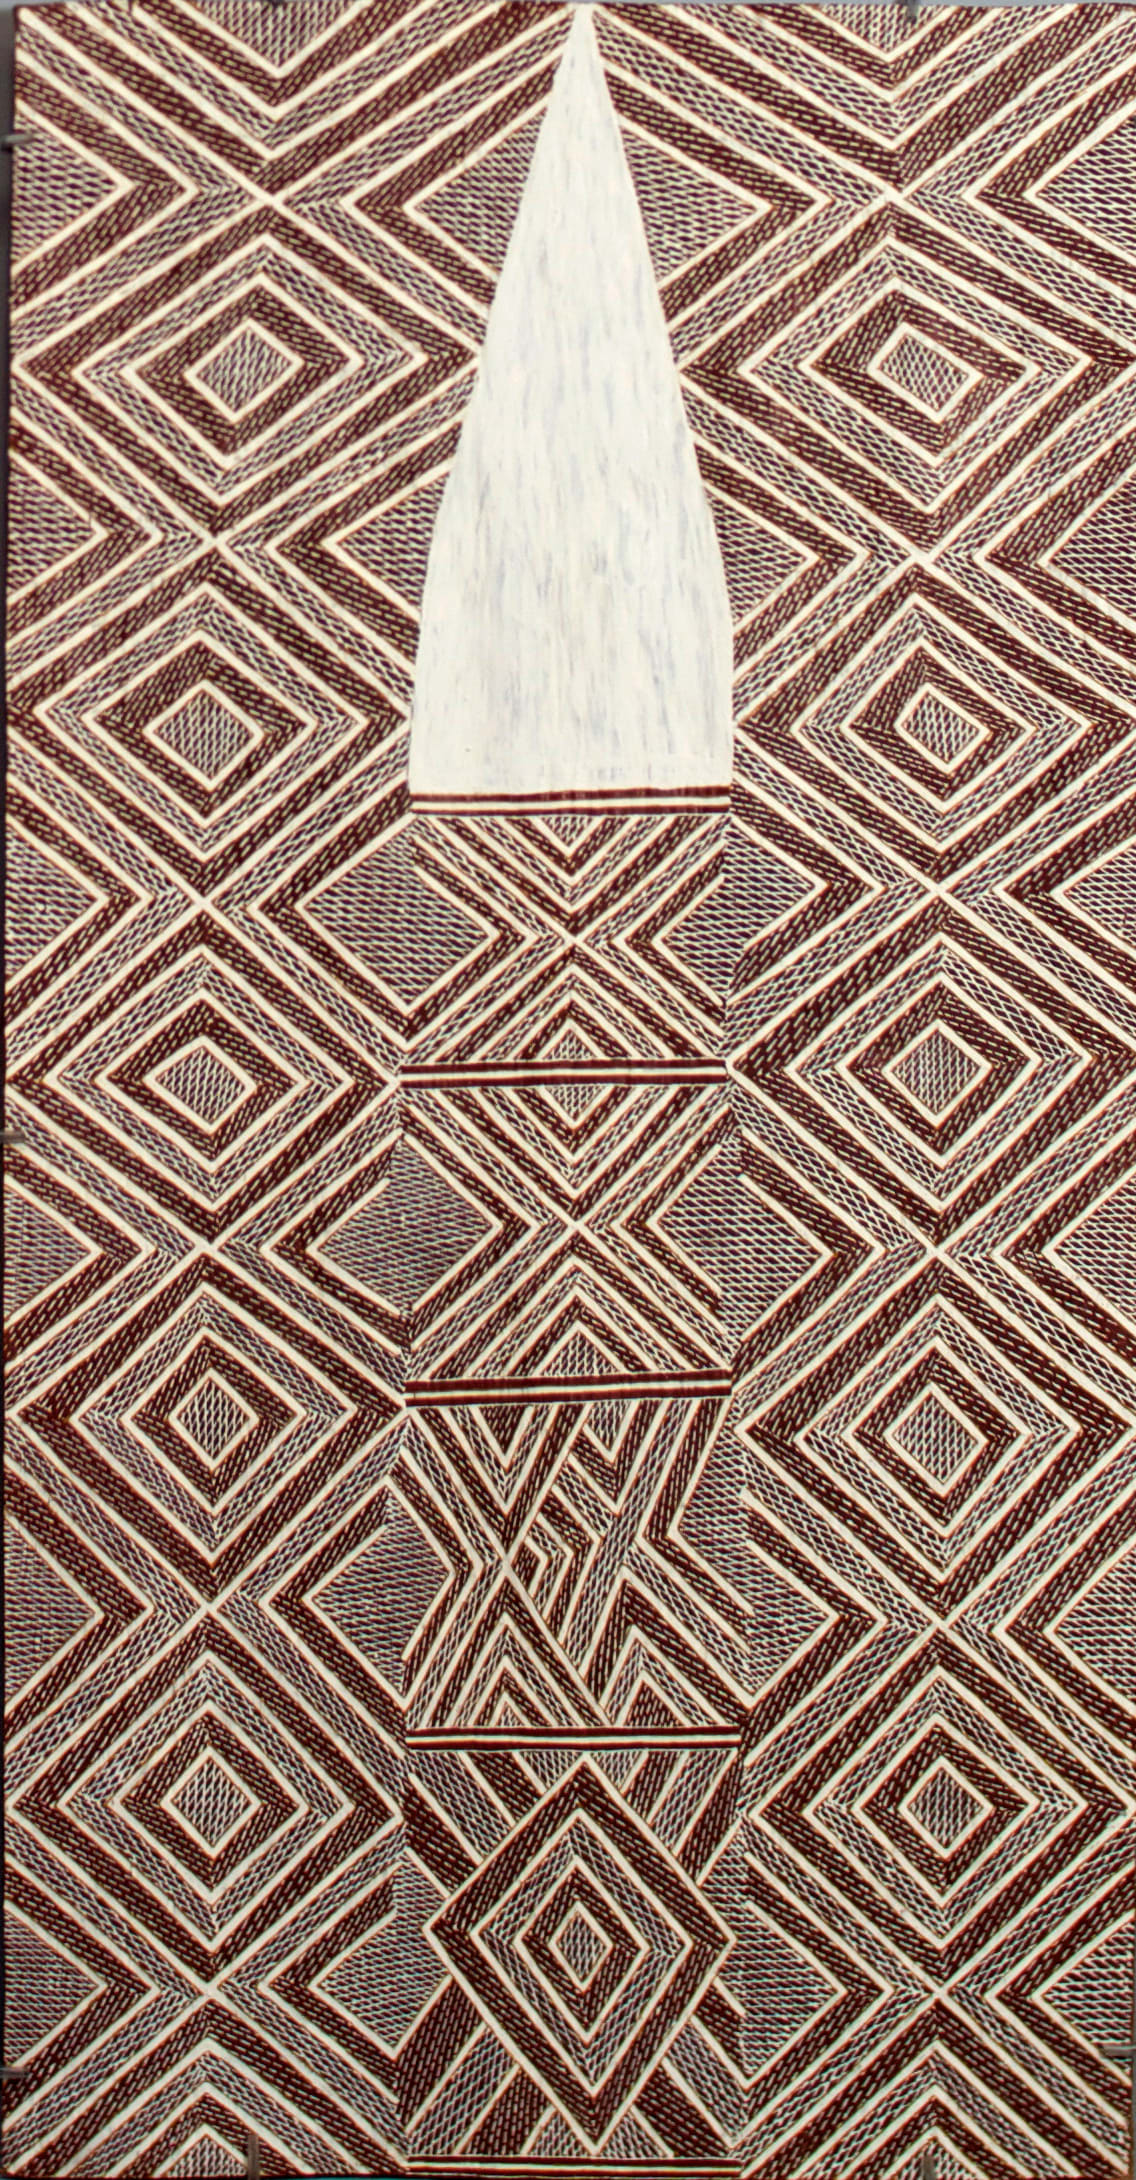 Garawan Wanambi Marranu at Raymangirr natural earth pigment on bark 57 x 92 cm